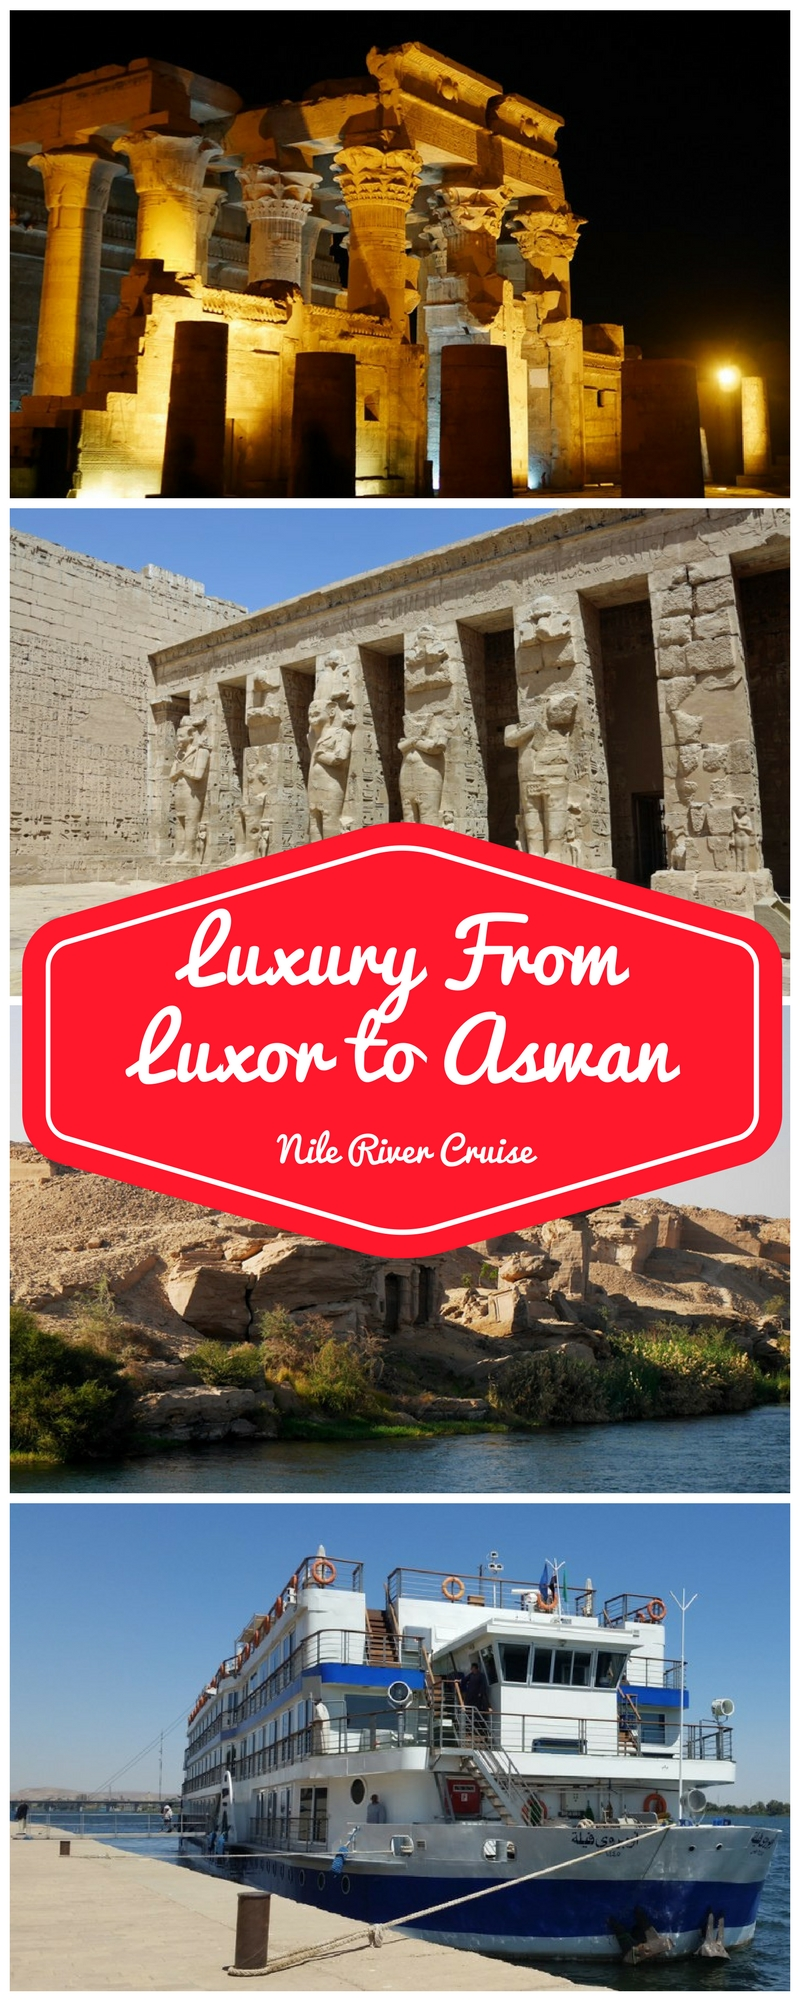 https://www.london-unattached.com/2016/03/nile-river-cruise-luxor-aswan/